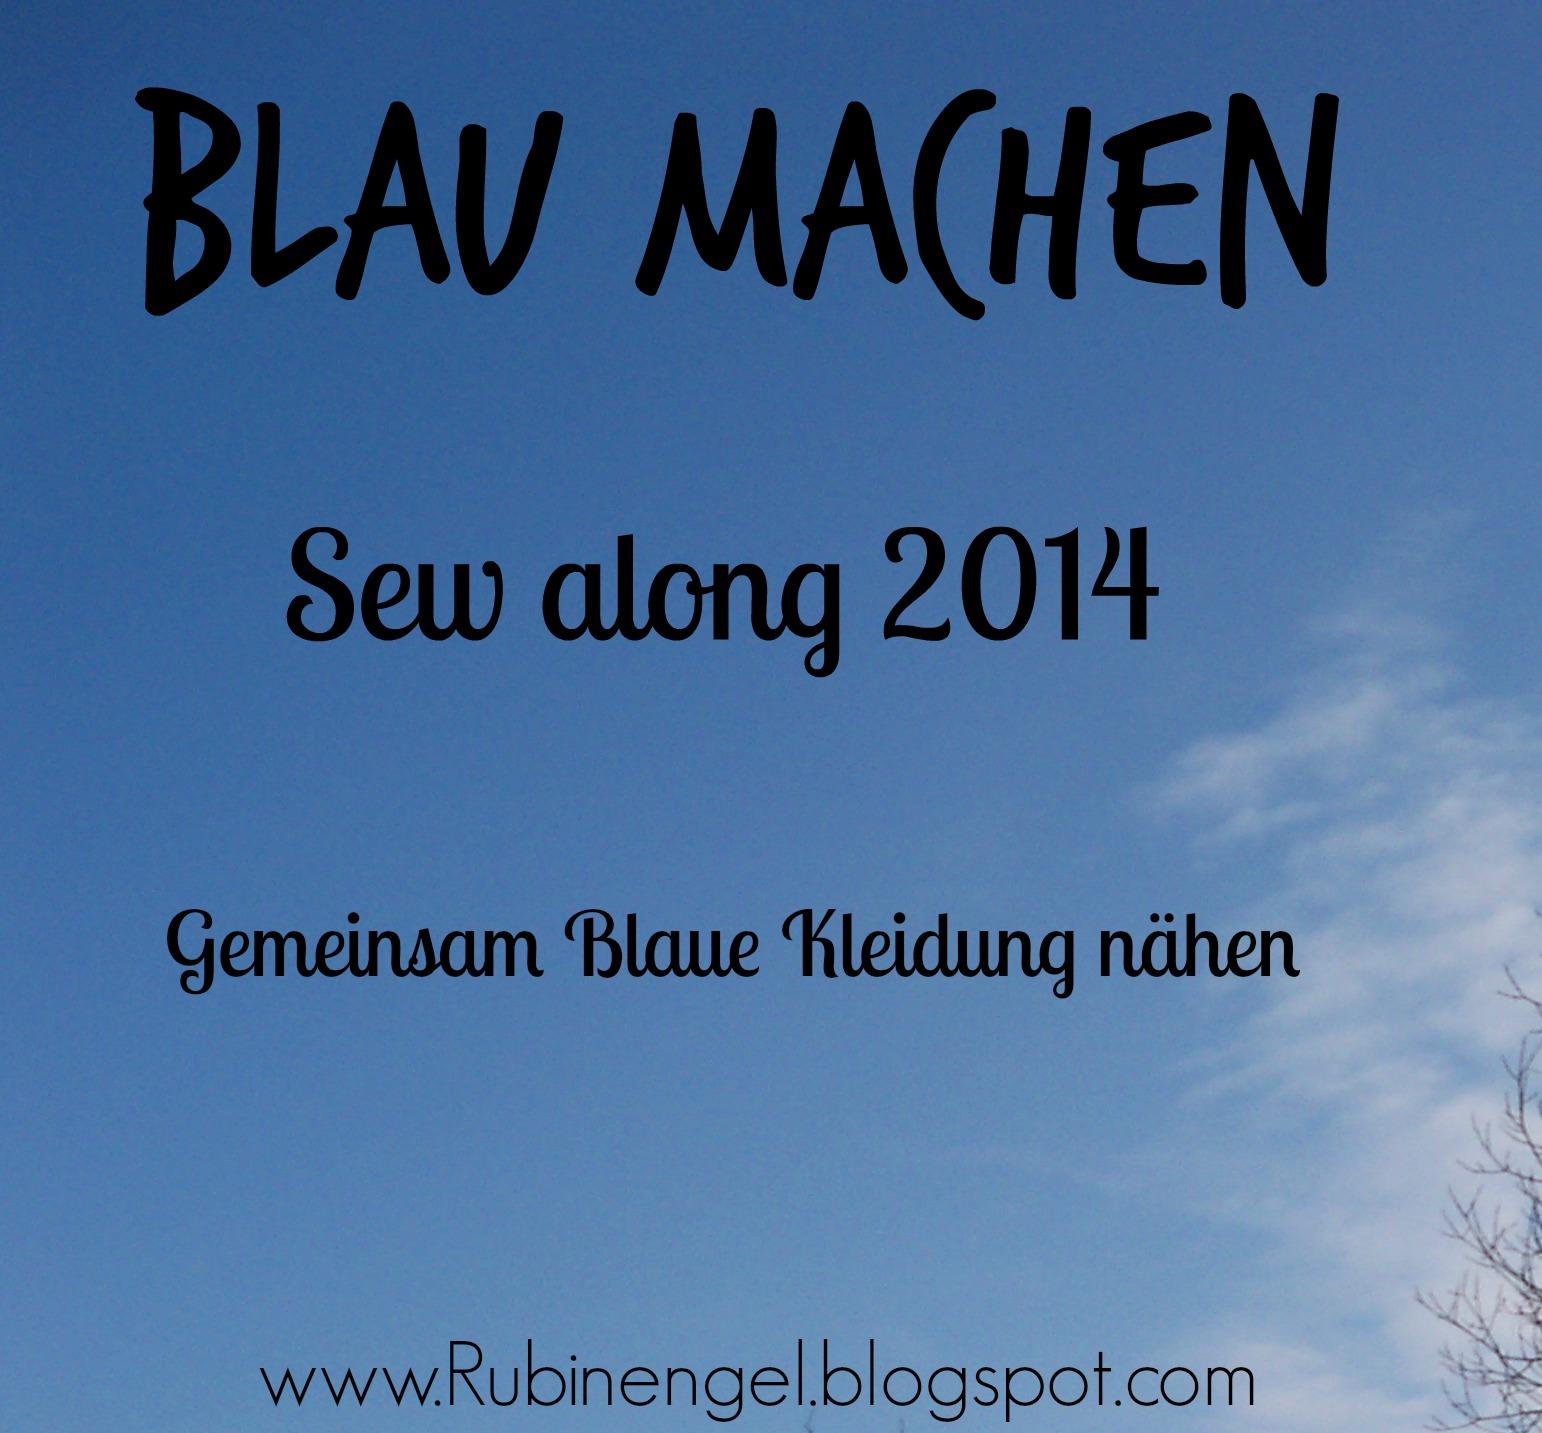 Blau machen Sew along 2014